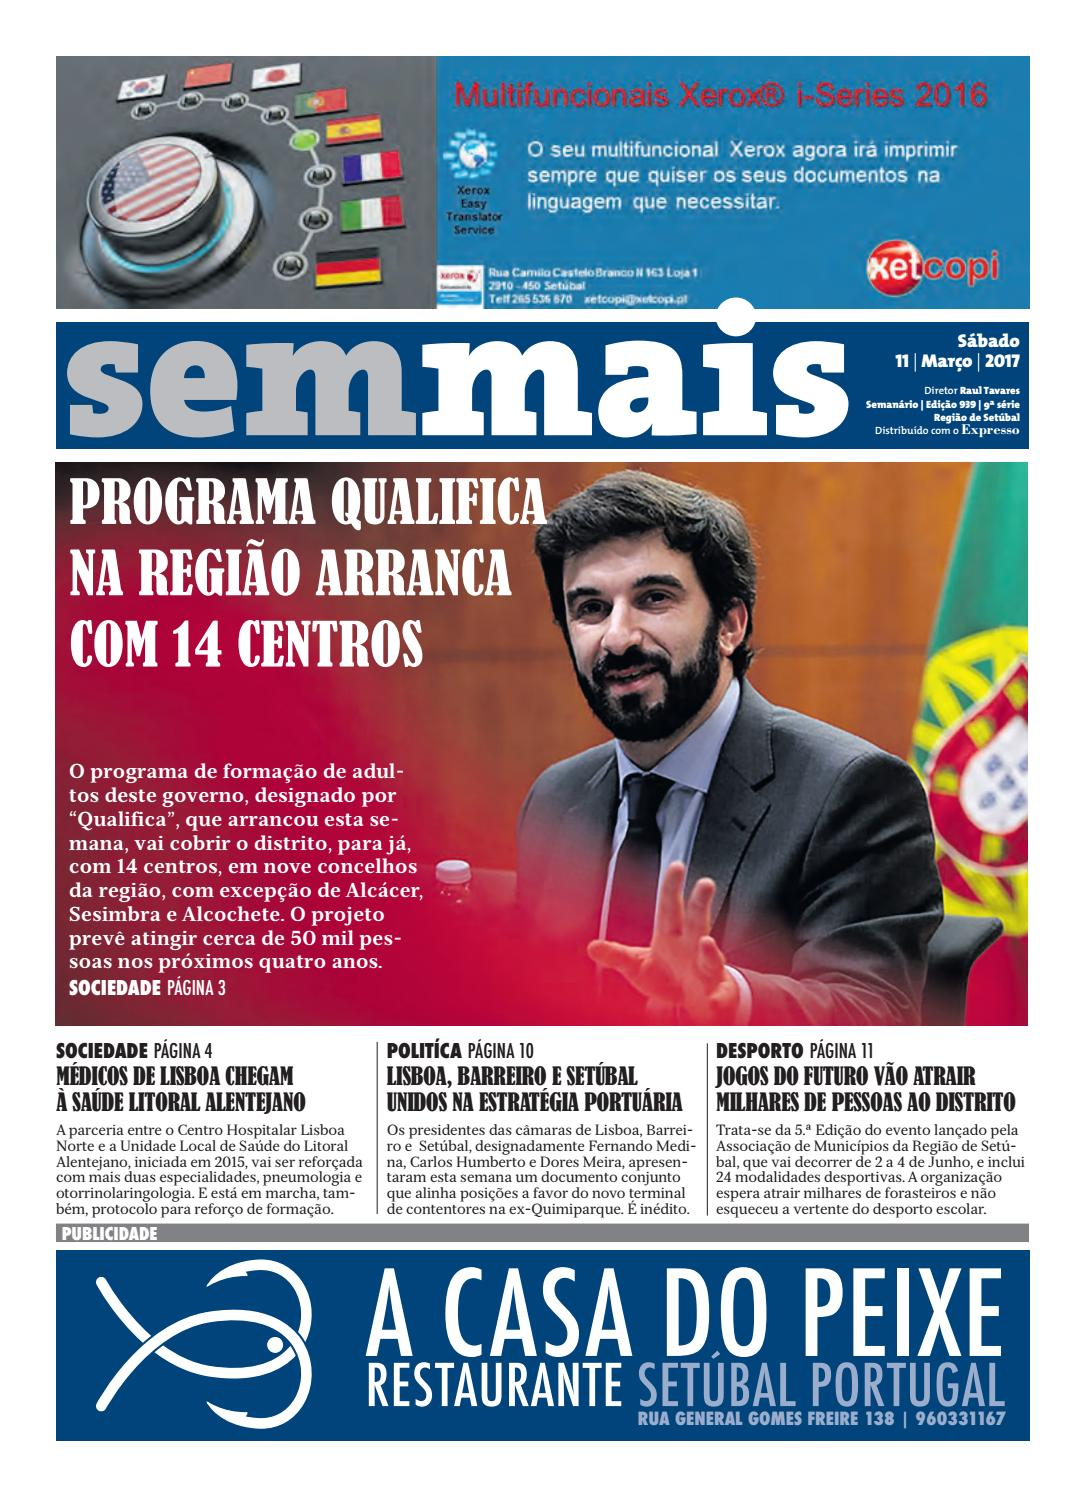 b2e4cd5c79be7 Semmais 11 marco 2017 by Mediasado - issuu